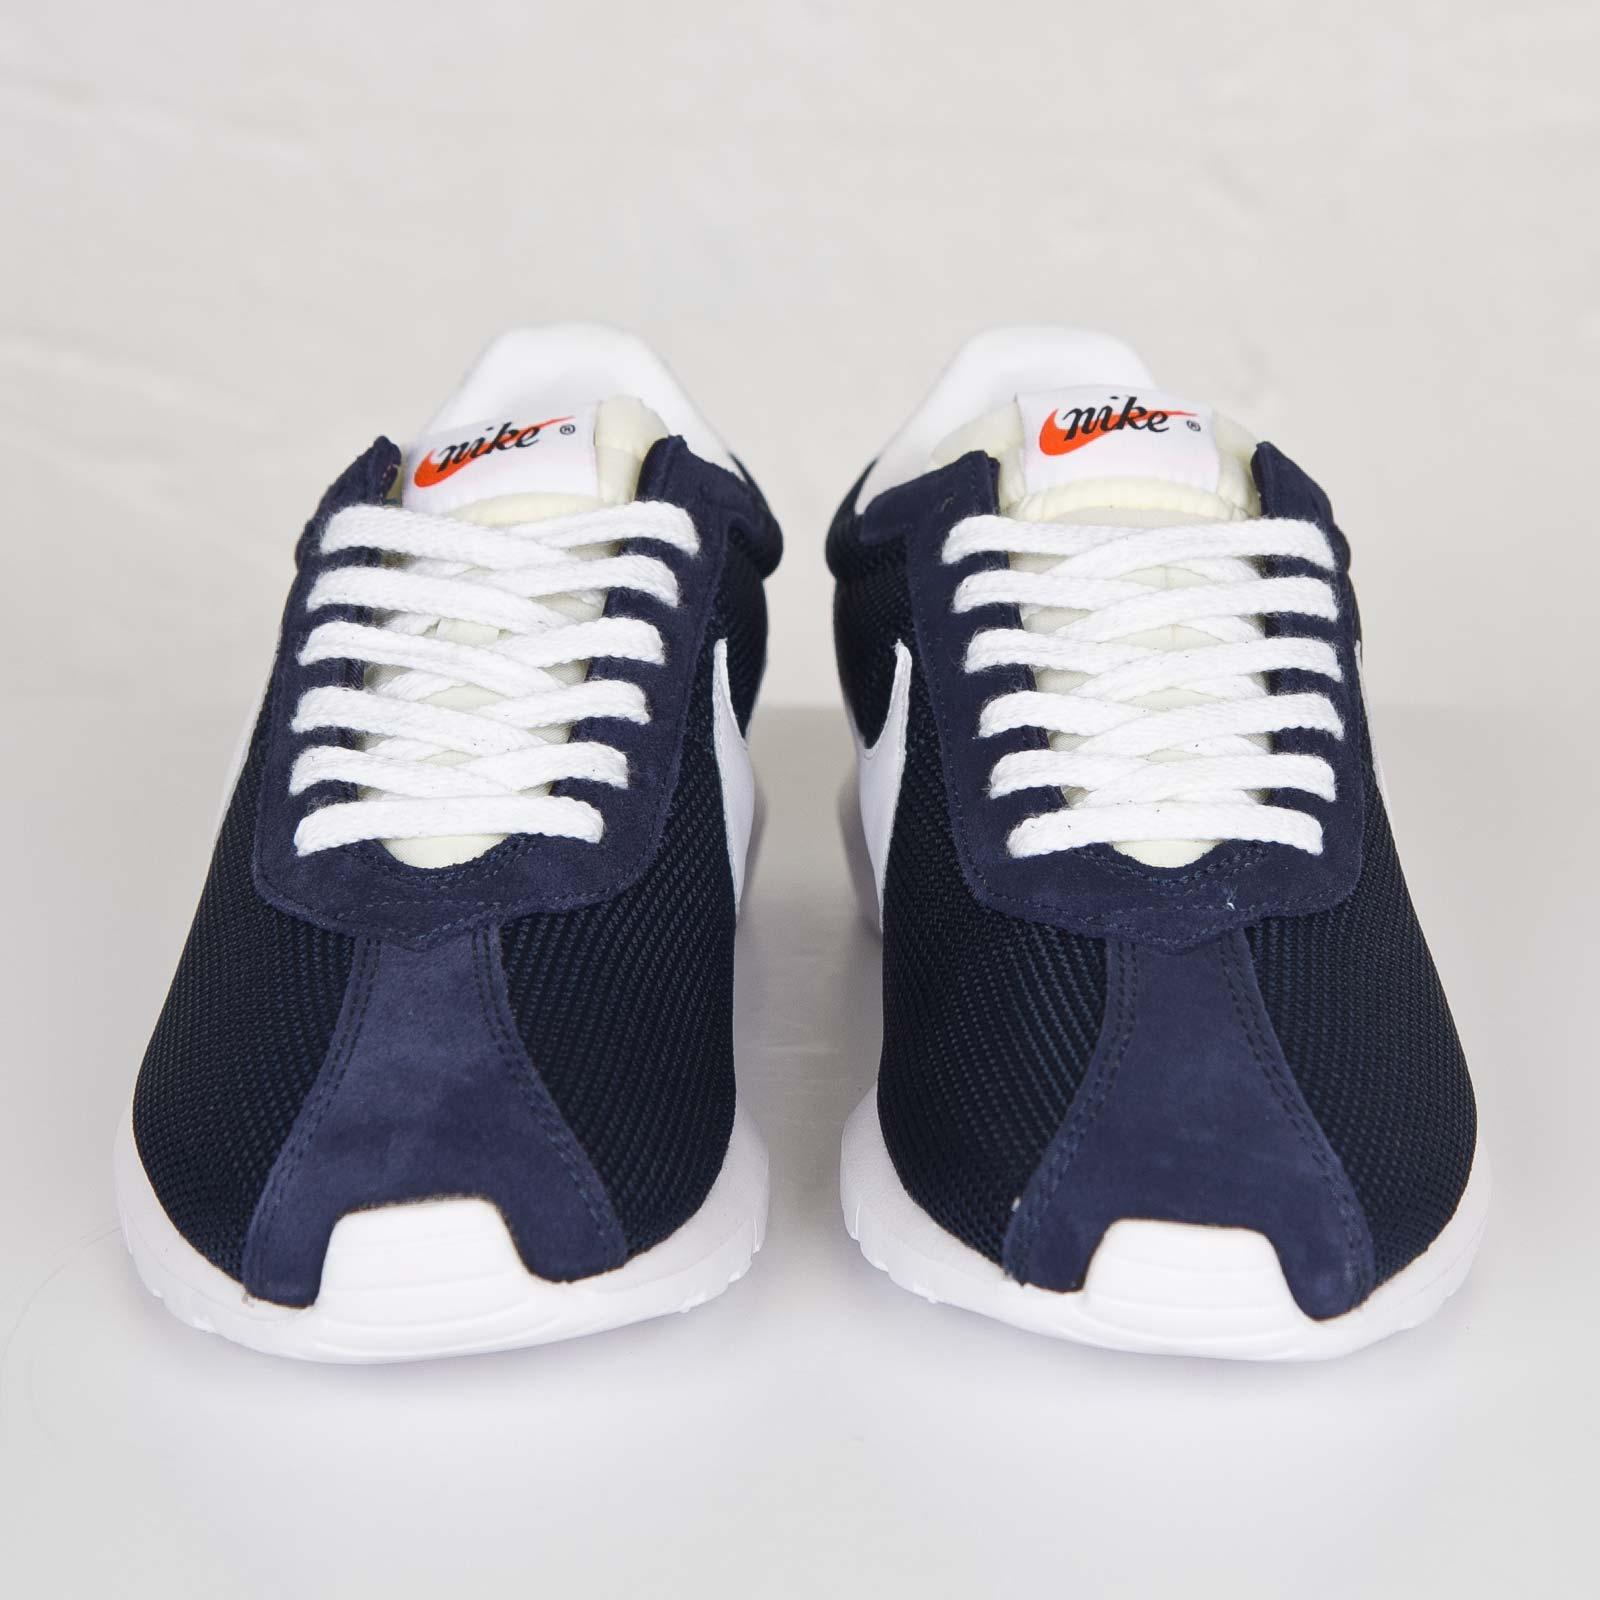 buy online 1ec21 54a90 Nike Roshe LD-1000 QS - 802022-401 - Sneakersnstuff   sneakers   streetwear  online since 1999